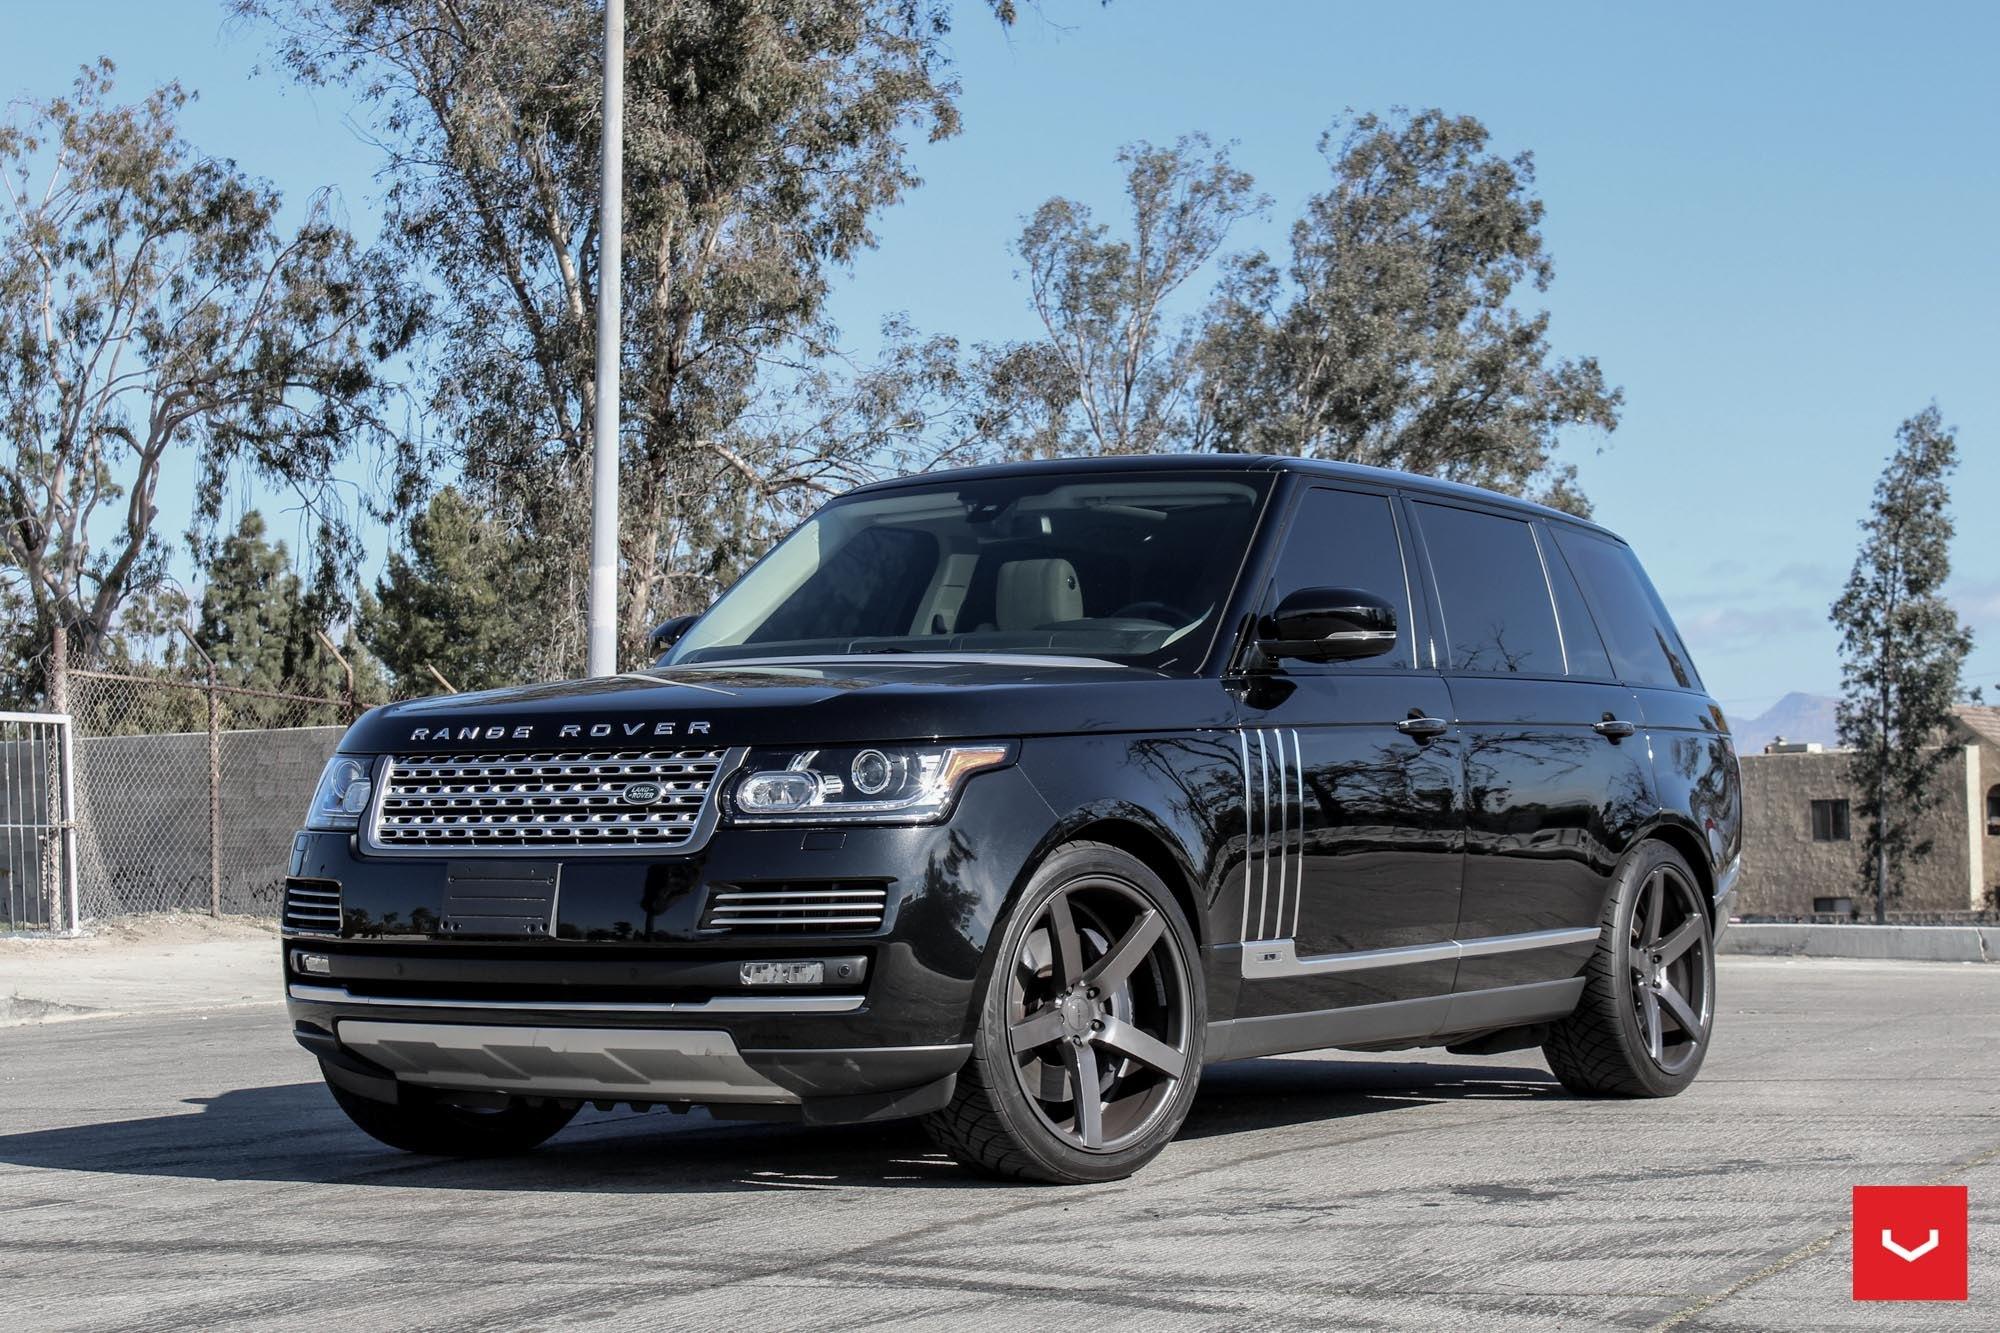 Subtle Custom Add s Enhancing Gloss Black Land Rover Range Rover